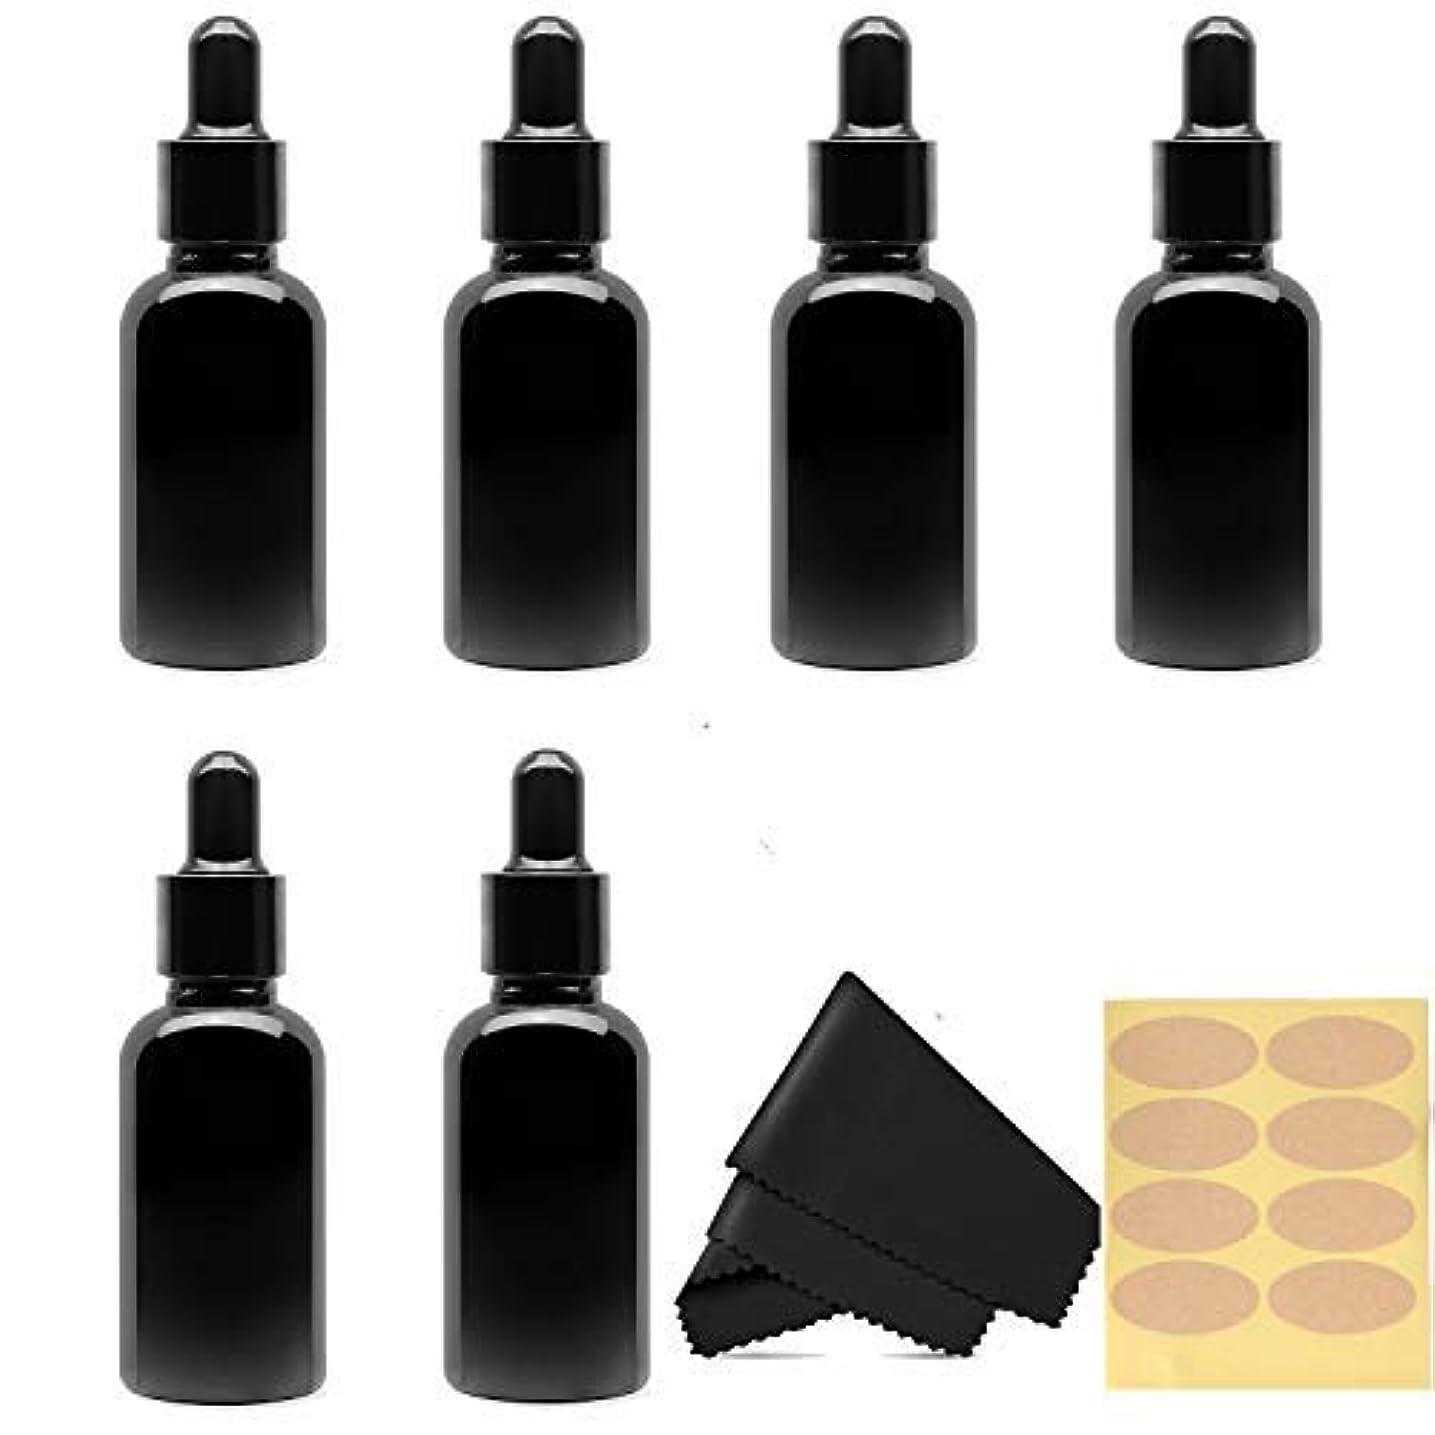 上院推測太字30 Ml (1 fl oz) Black Glass Essential Oil Bottles with Eye Droppers, 6 Pack [並行輸入品]